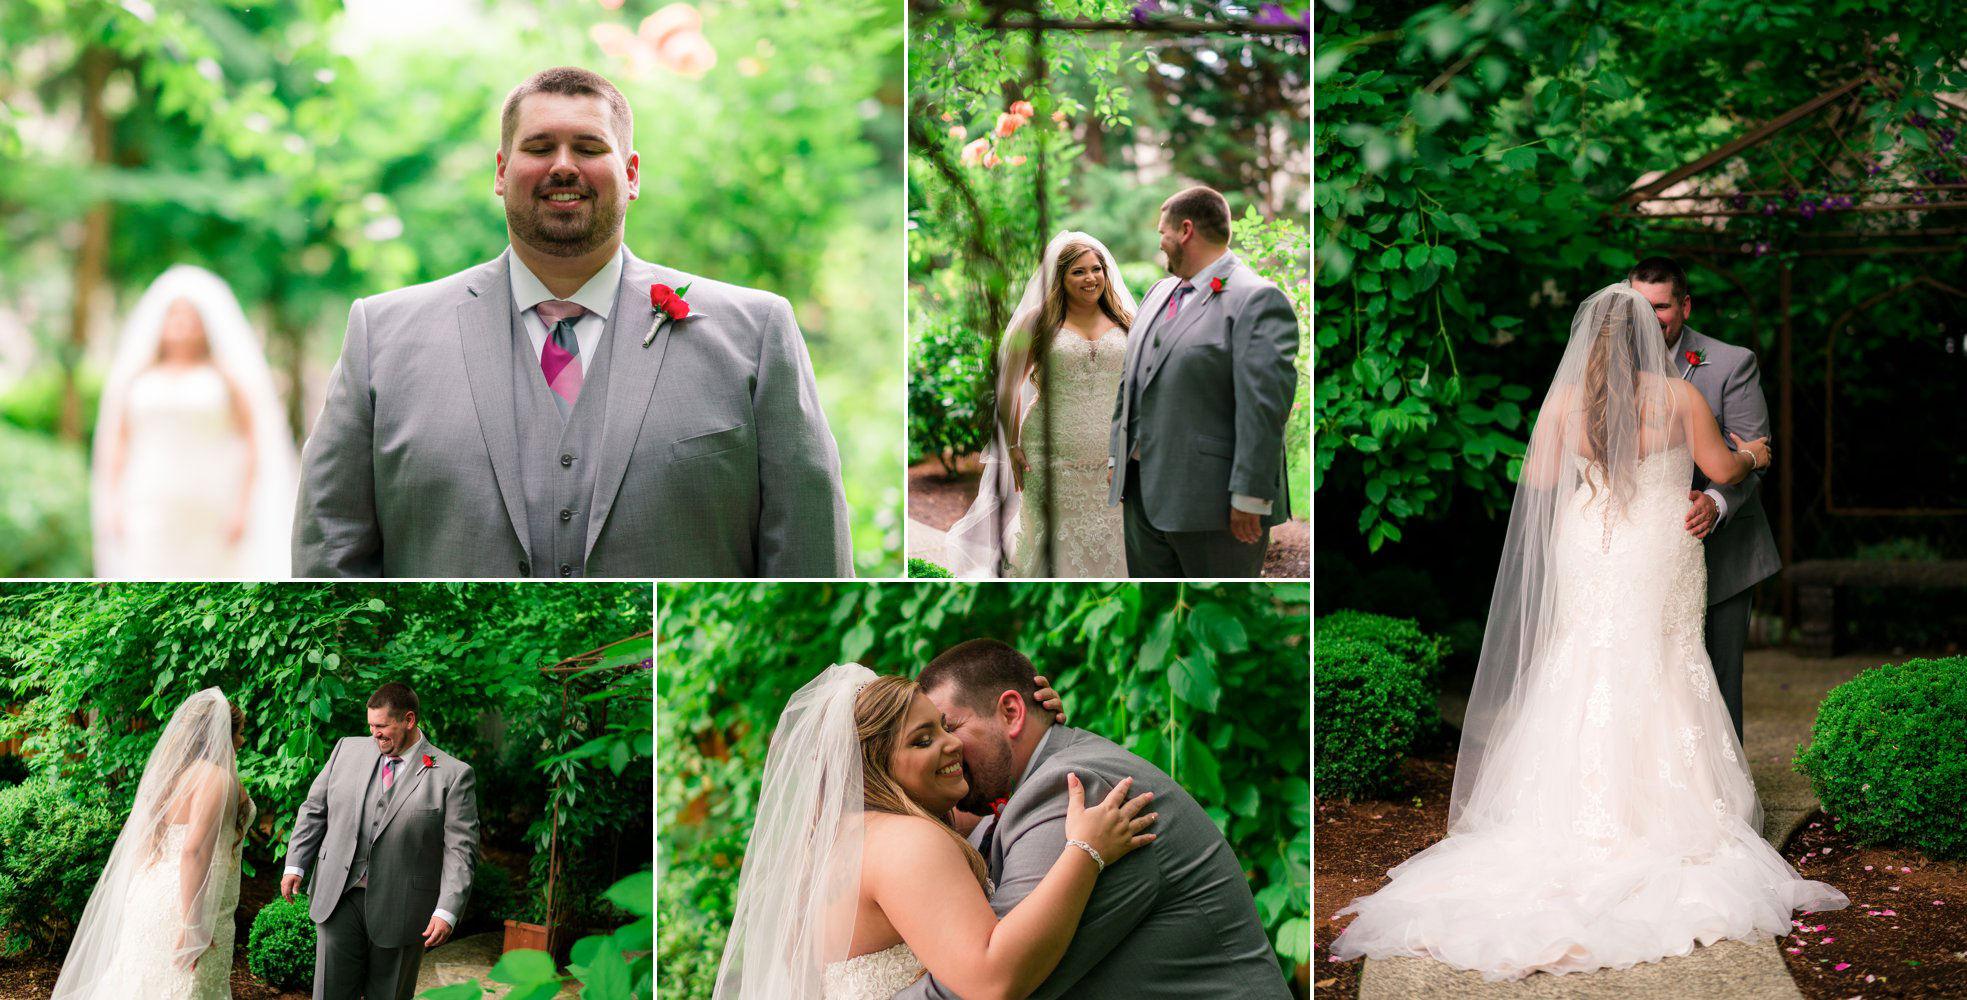 Gray-Gables-Estate-Wedding-Photography-3.jpg